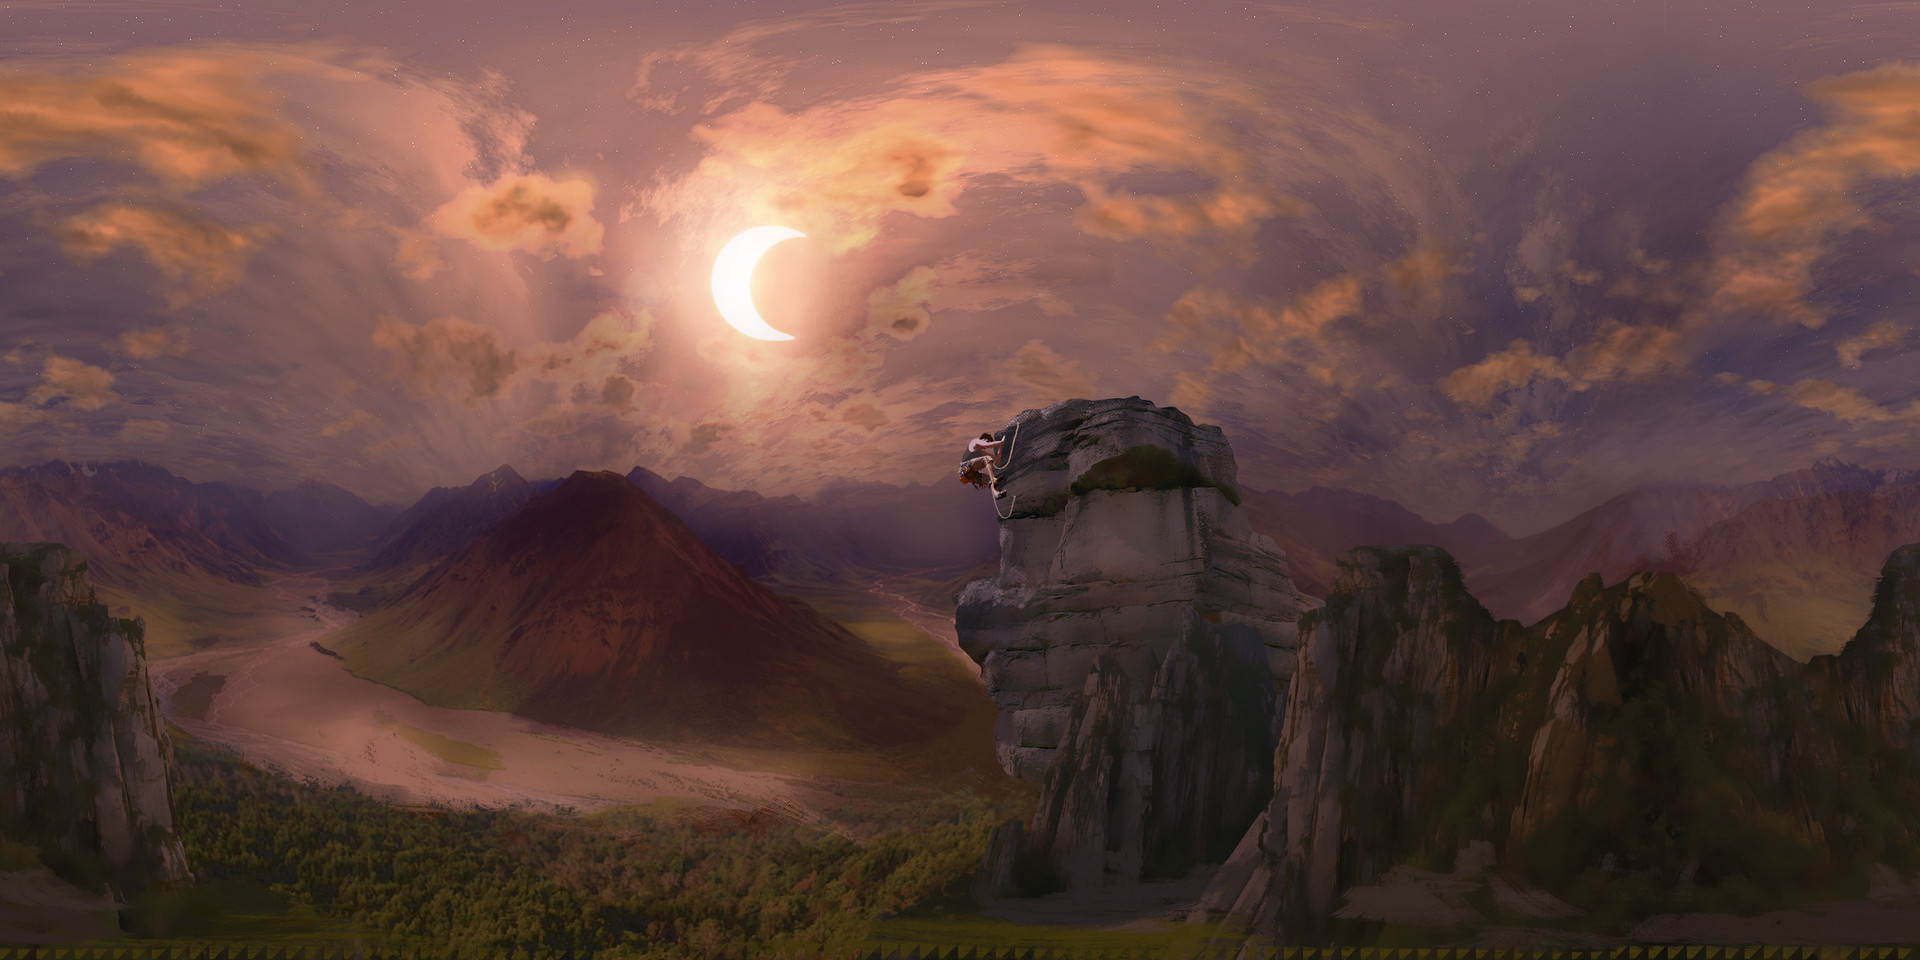 Alejandro gonzalez eclipse 360 painting